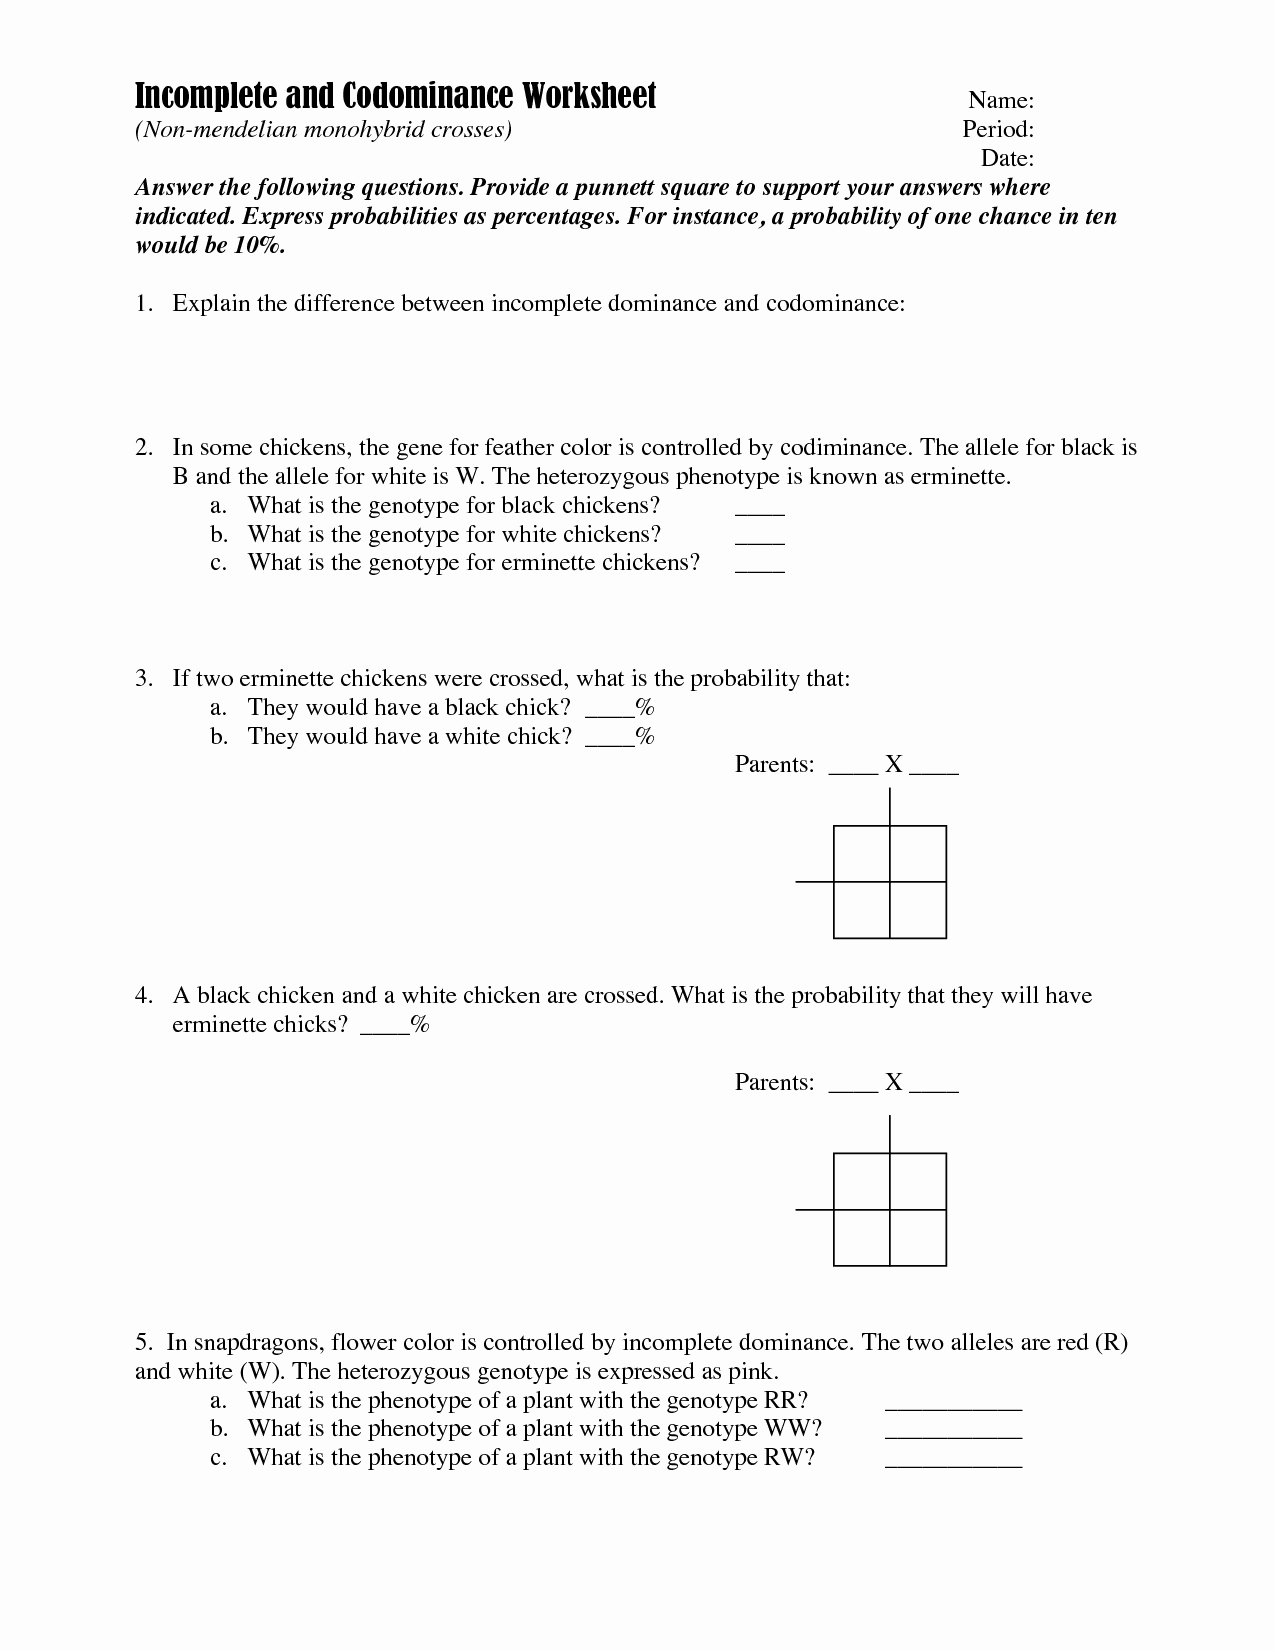 Monohybrid Cross Worksheet Answers New 14 Best Of Monohybrid Cross Worksheet Answer Key